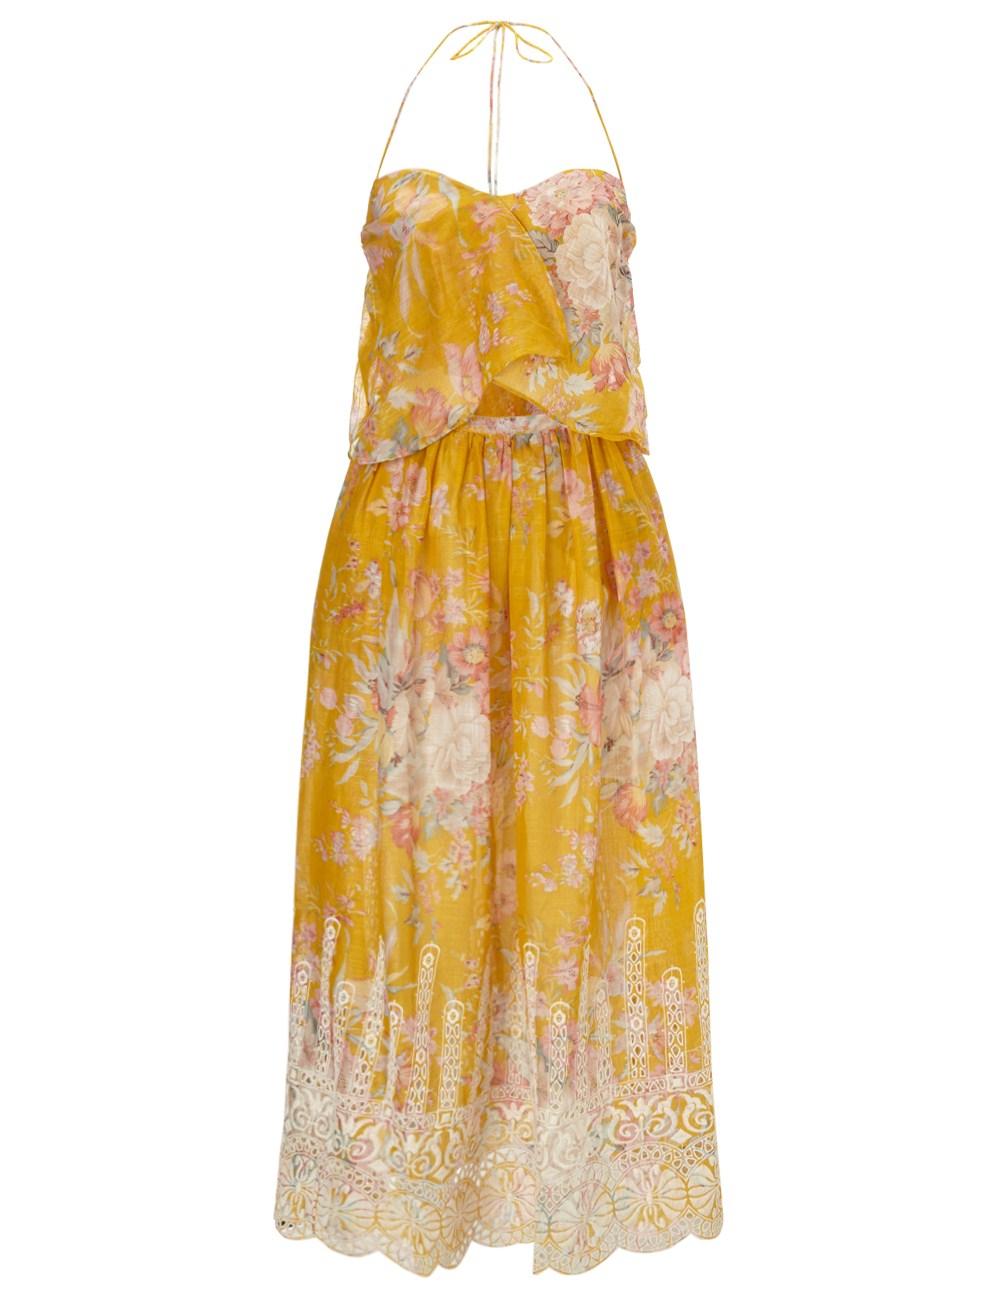 Zimmerman Yellow Floral Dress